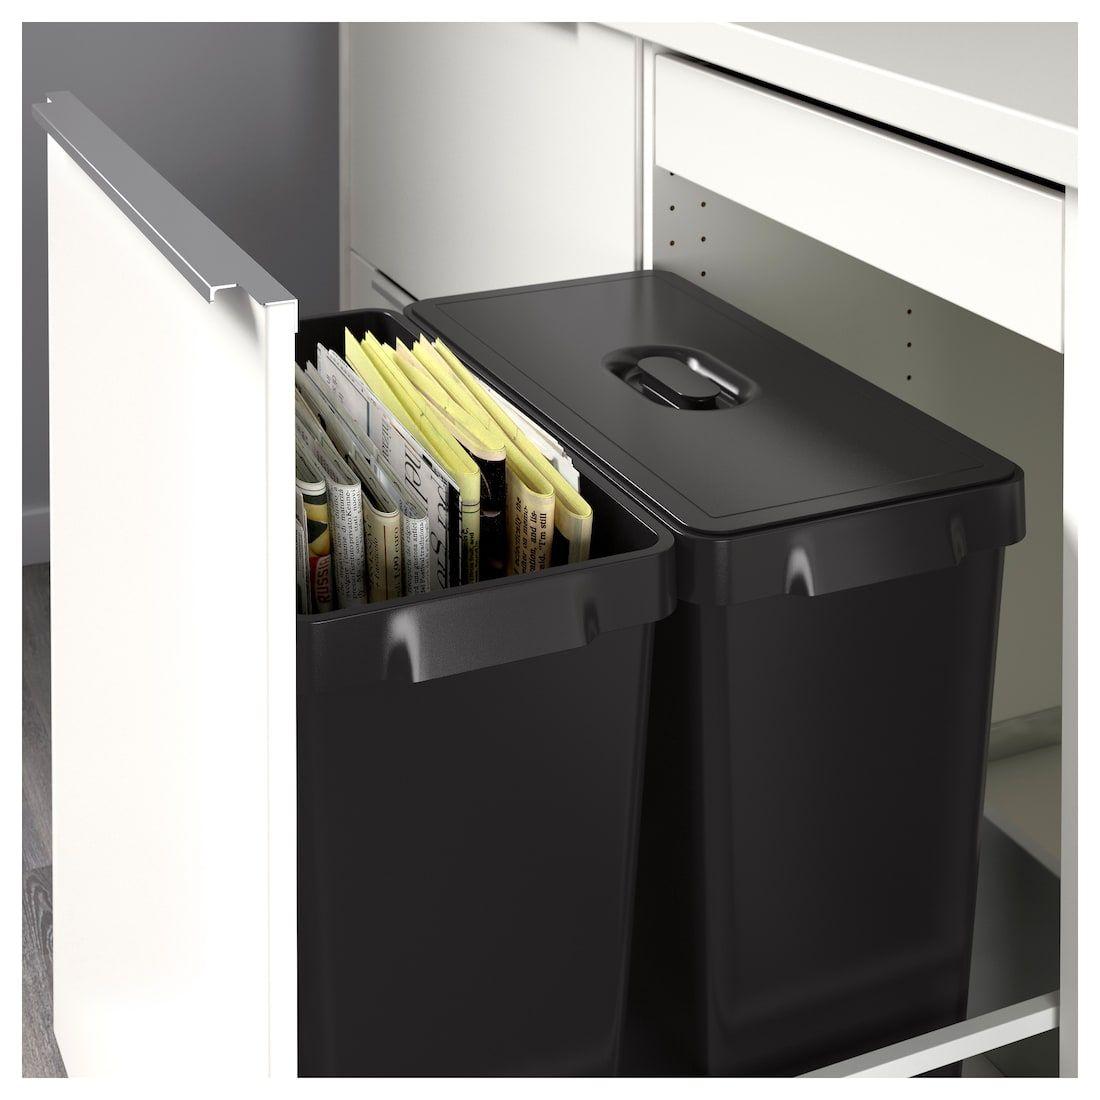 Pin by Karen Johnson on Keuken  Recycling bins, Kitchen waste bin